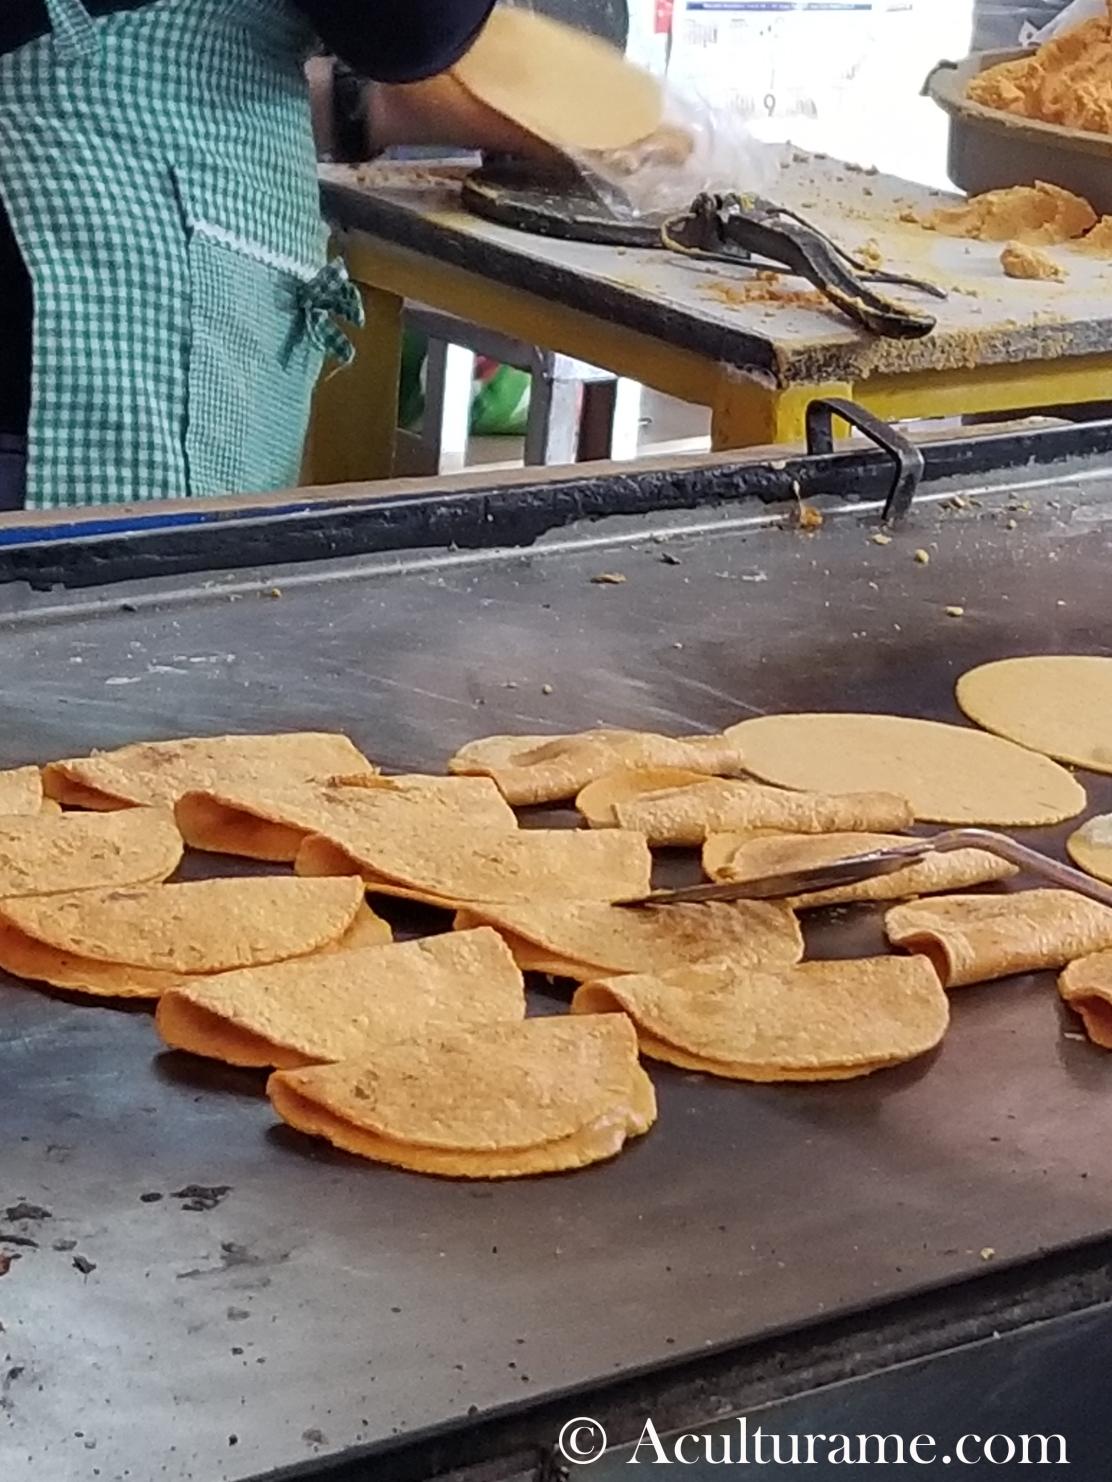 One of the many stands of enchiladas potosinas selling at Mercado República.